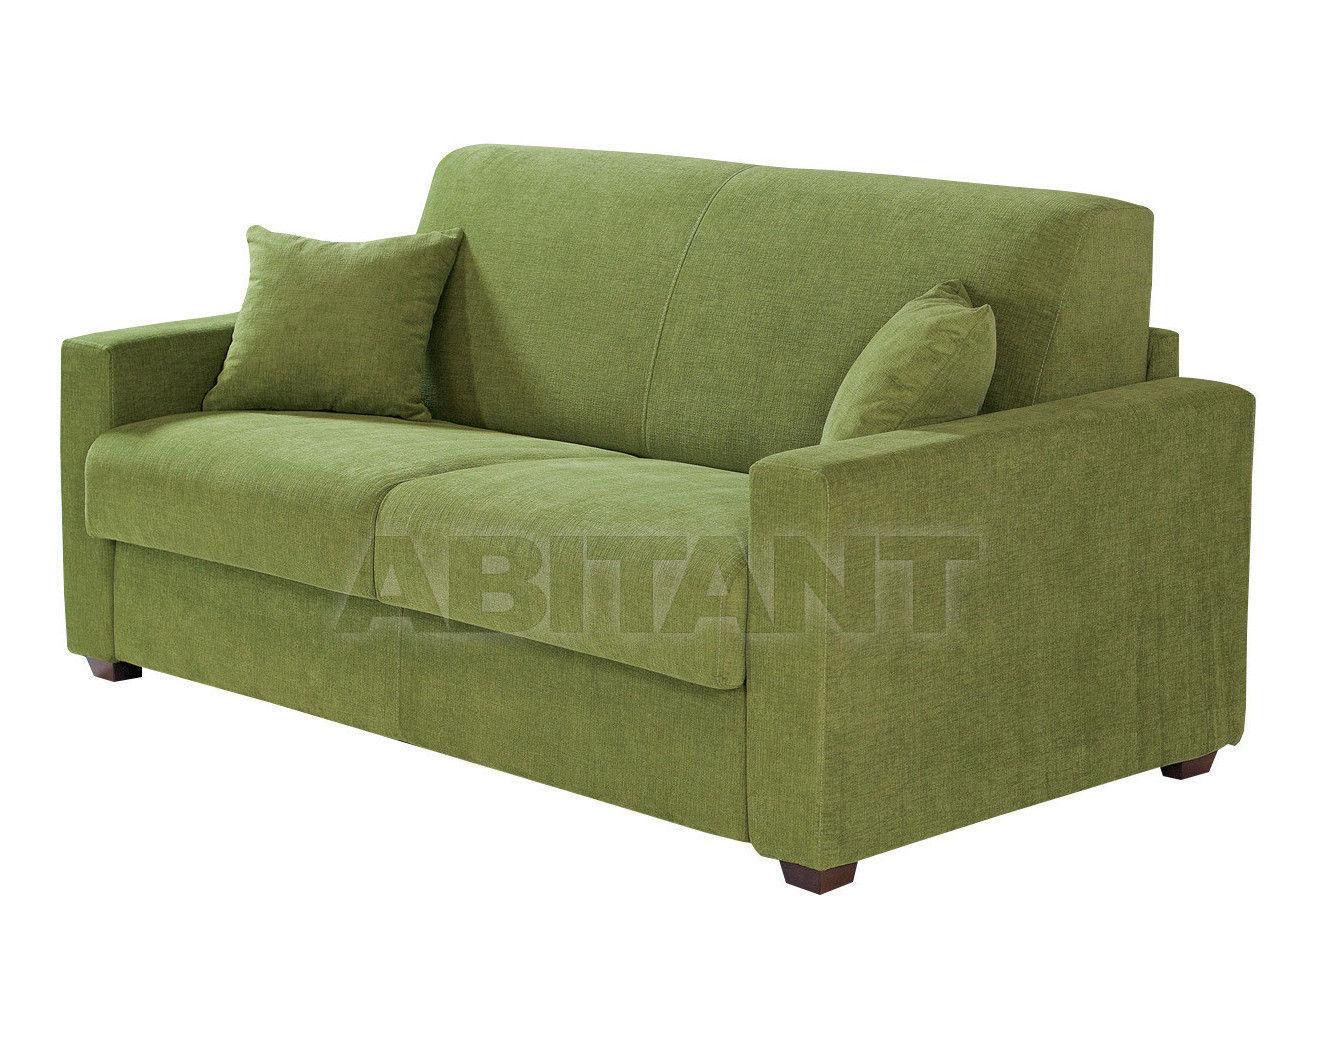 Купить Диван Trading Sofas s.r.l. by G.M. Italia Divani Imbottiti Antares 690